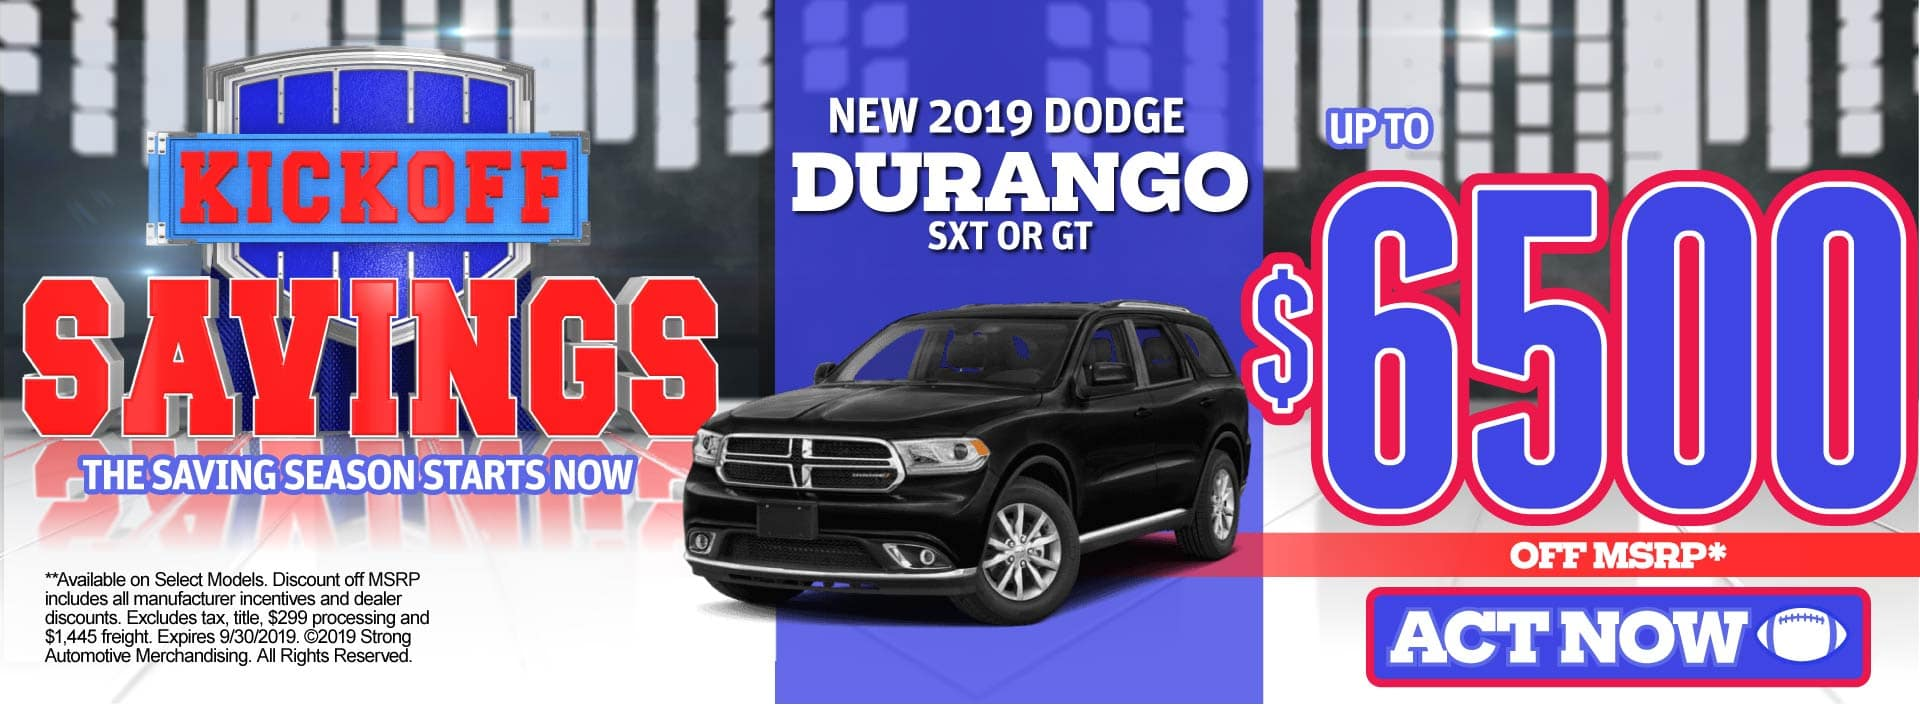 Dodge Dealers In Delaware >> Safford Chrysler Dodge Jeep Ram Of Salisbury New Used Car